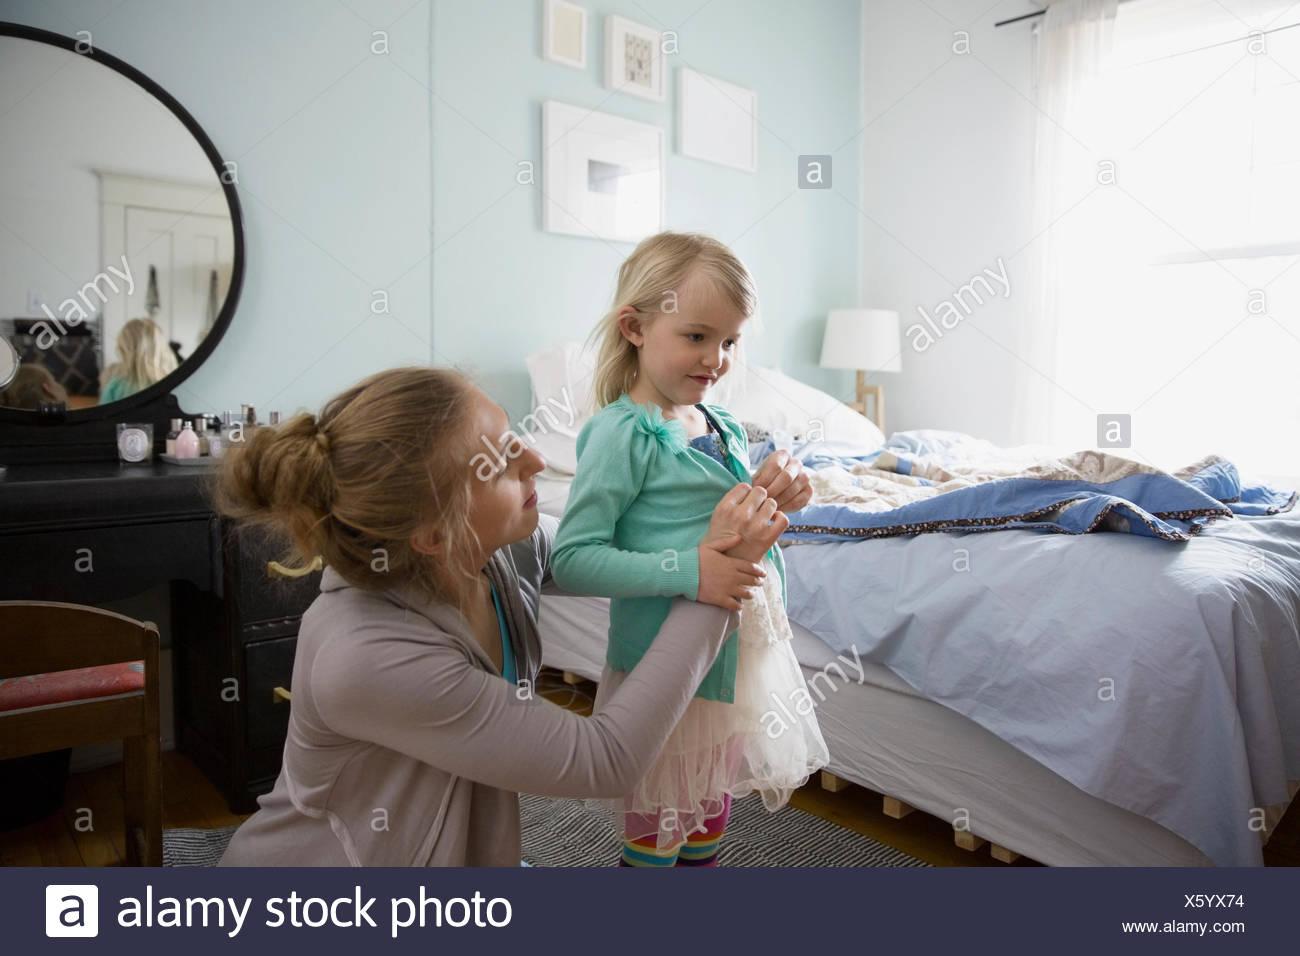 Mother dressing daughter in bedroom - Stock Image